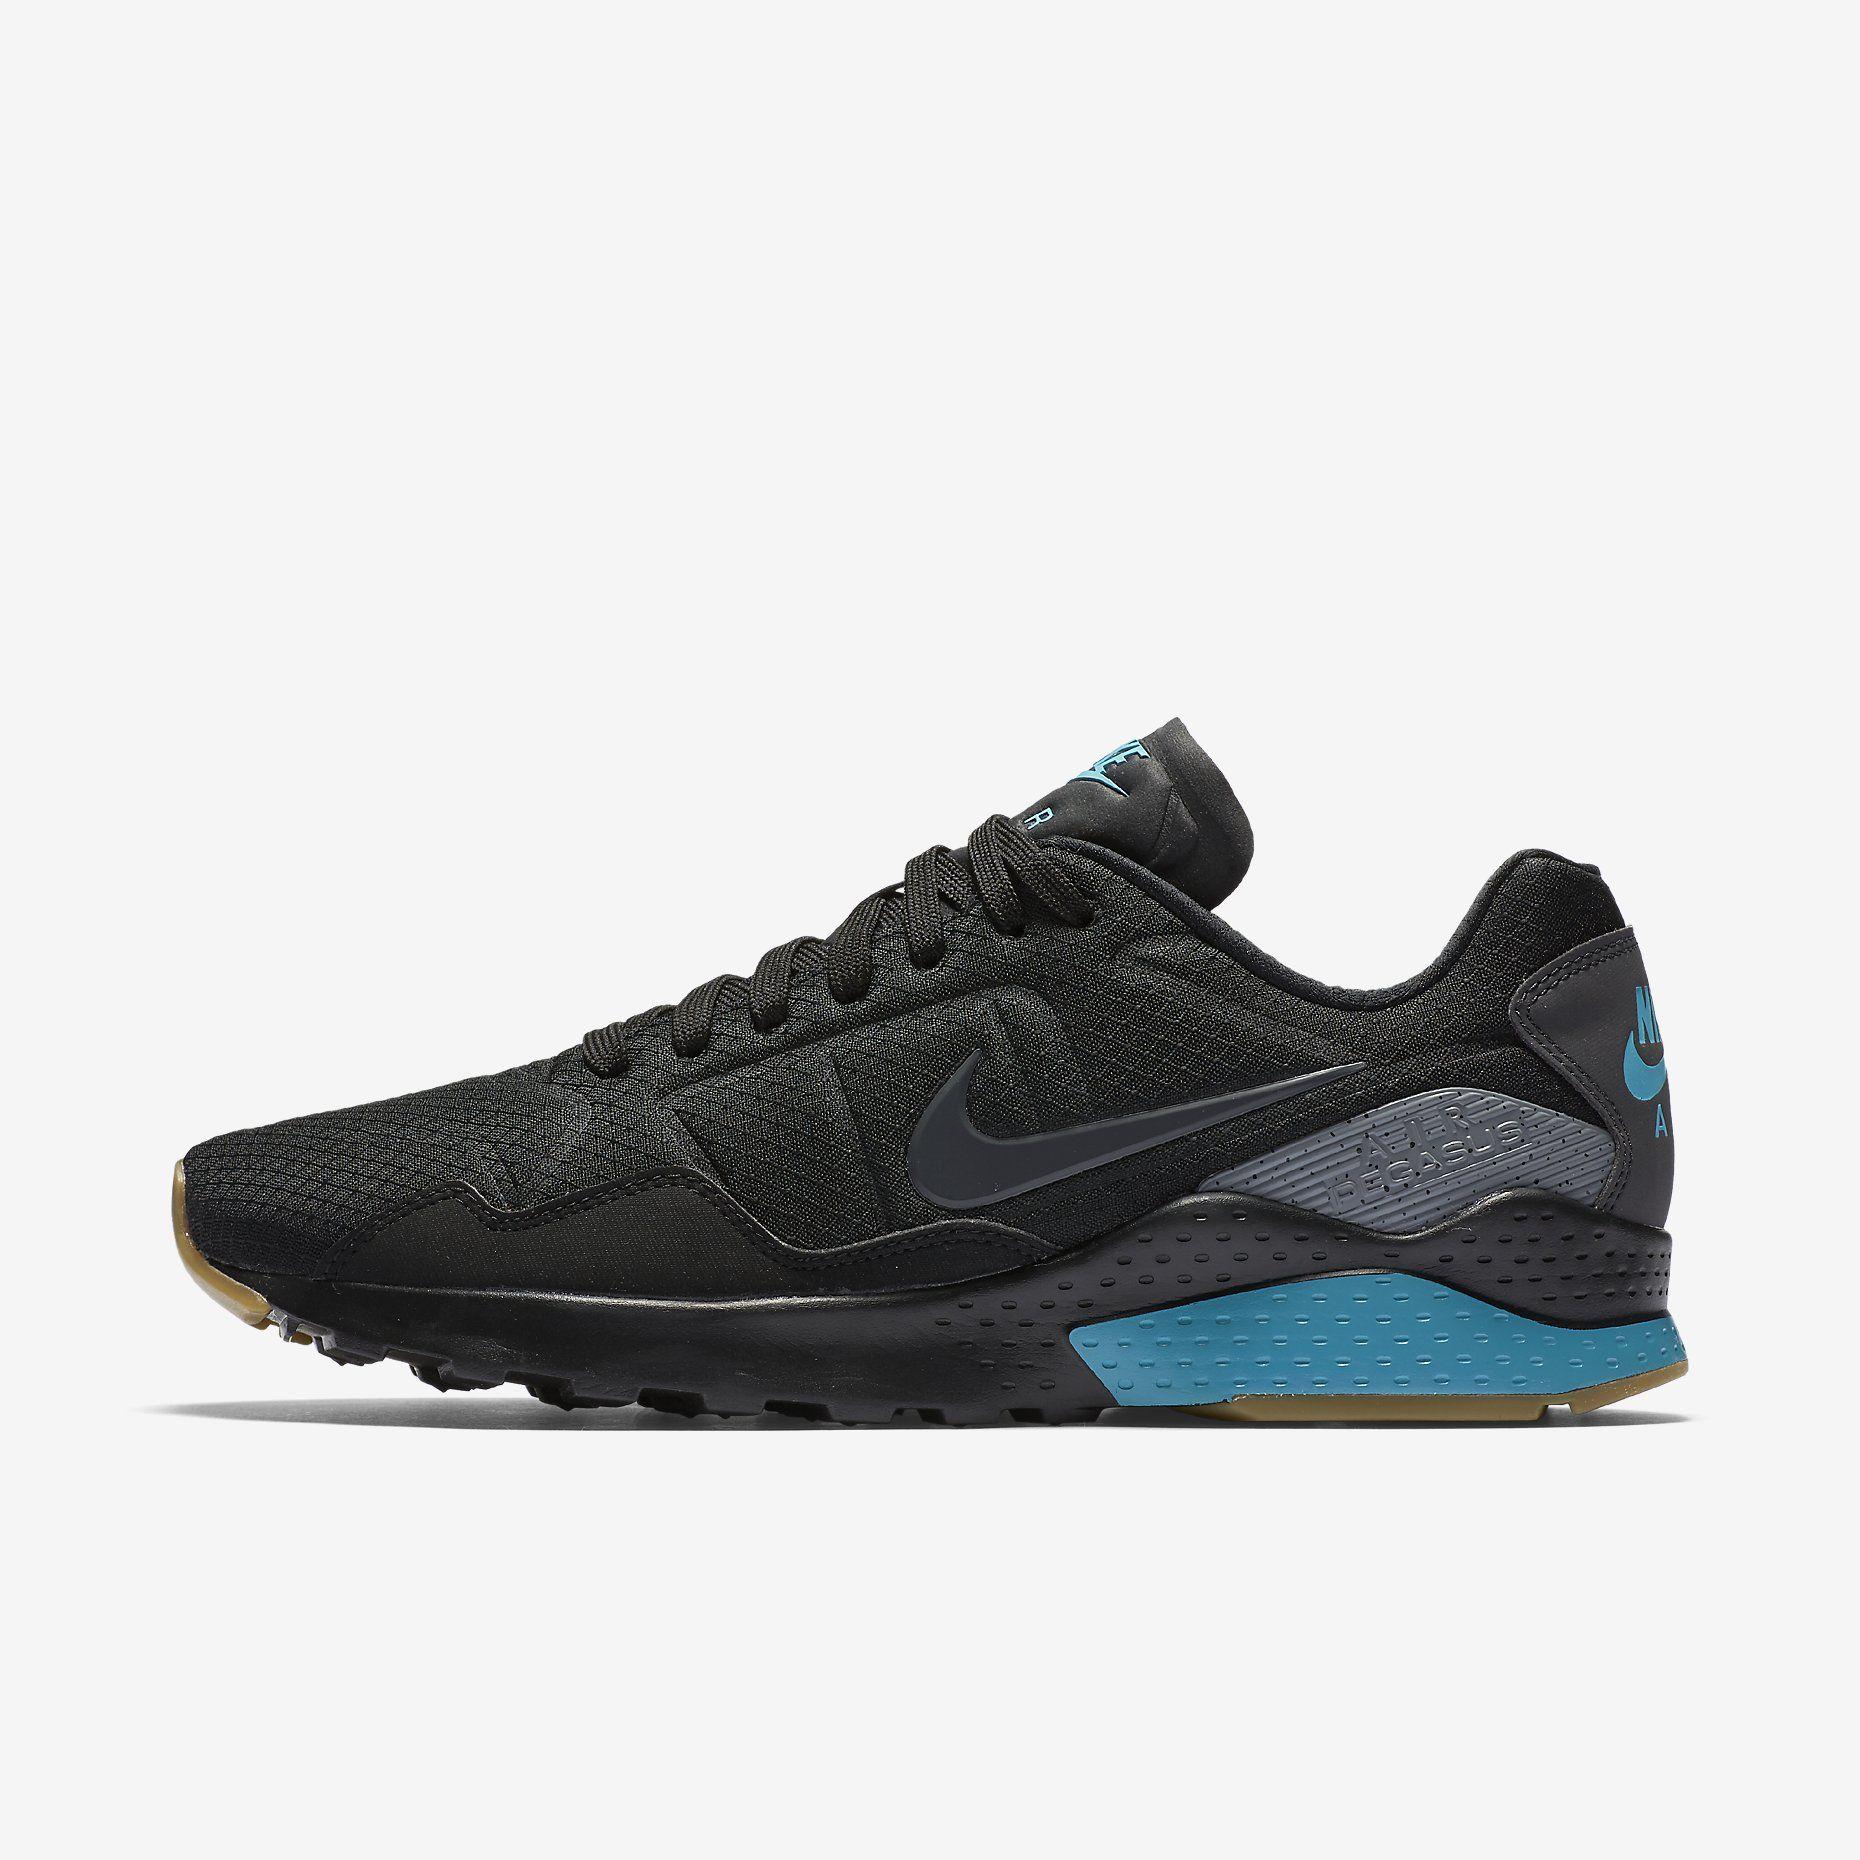 1b22f703e662 Nike Air Zoom Pegasus 92 Men s Shoe  Black Gamma Blue Fire Pink ...